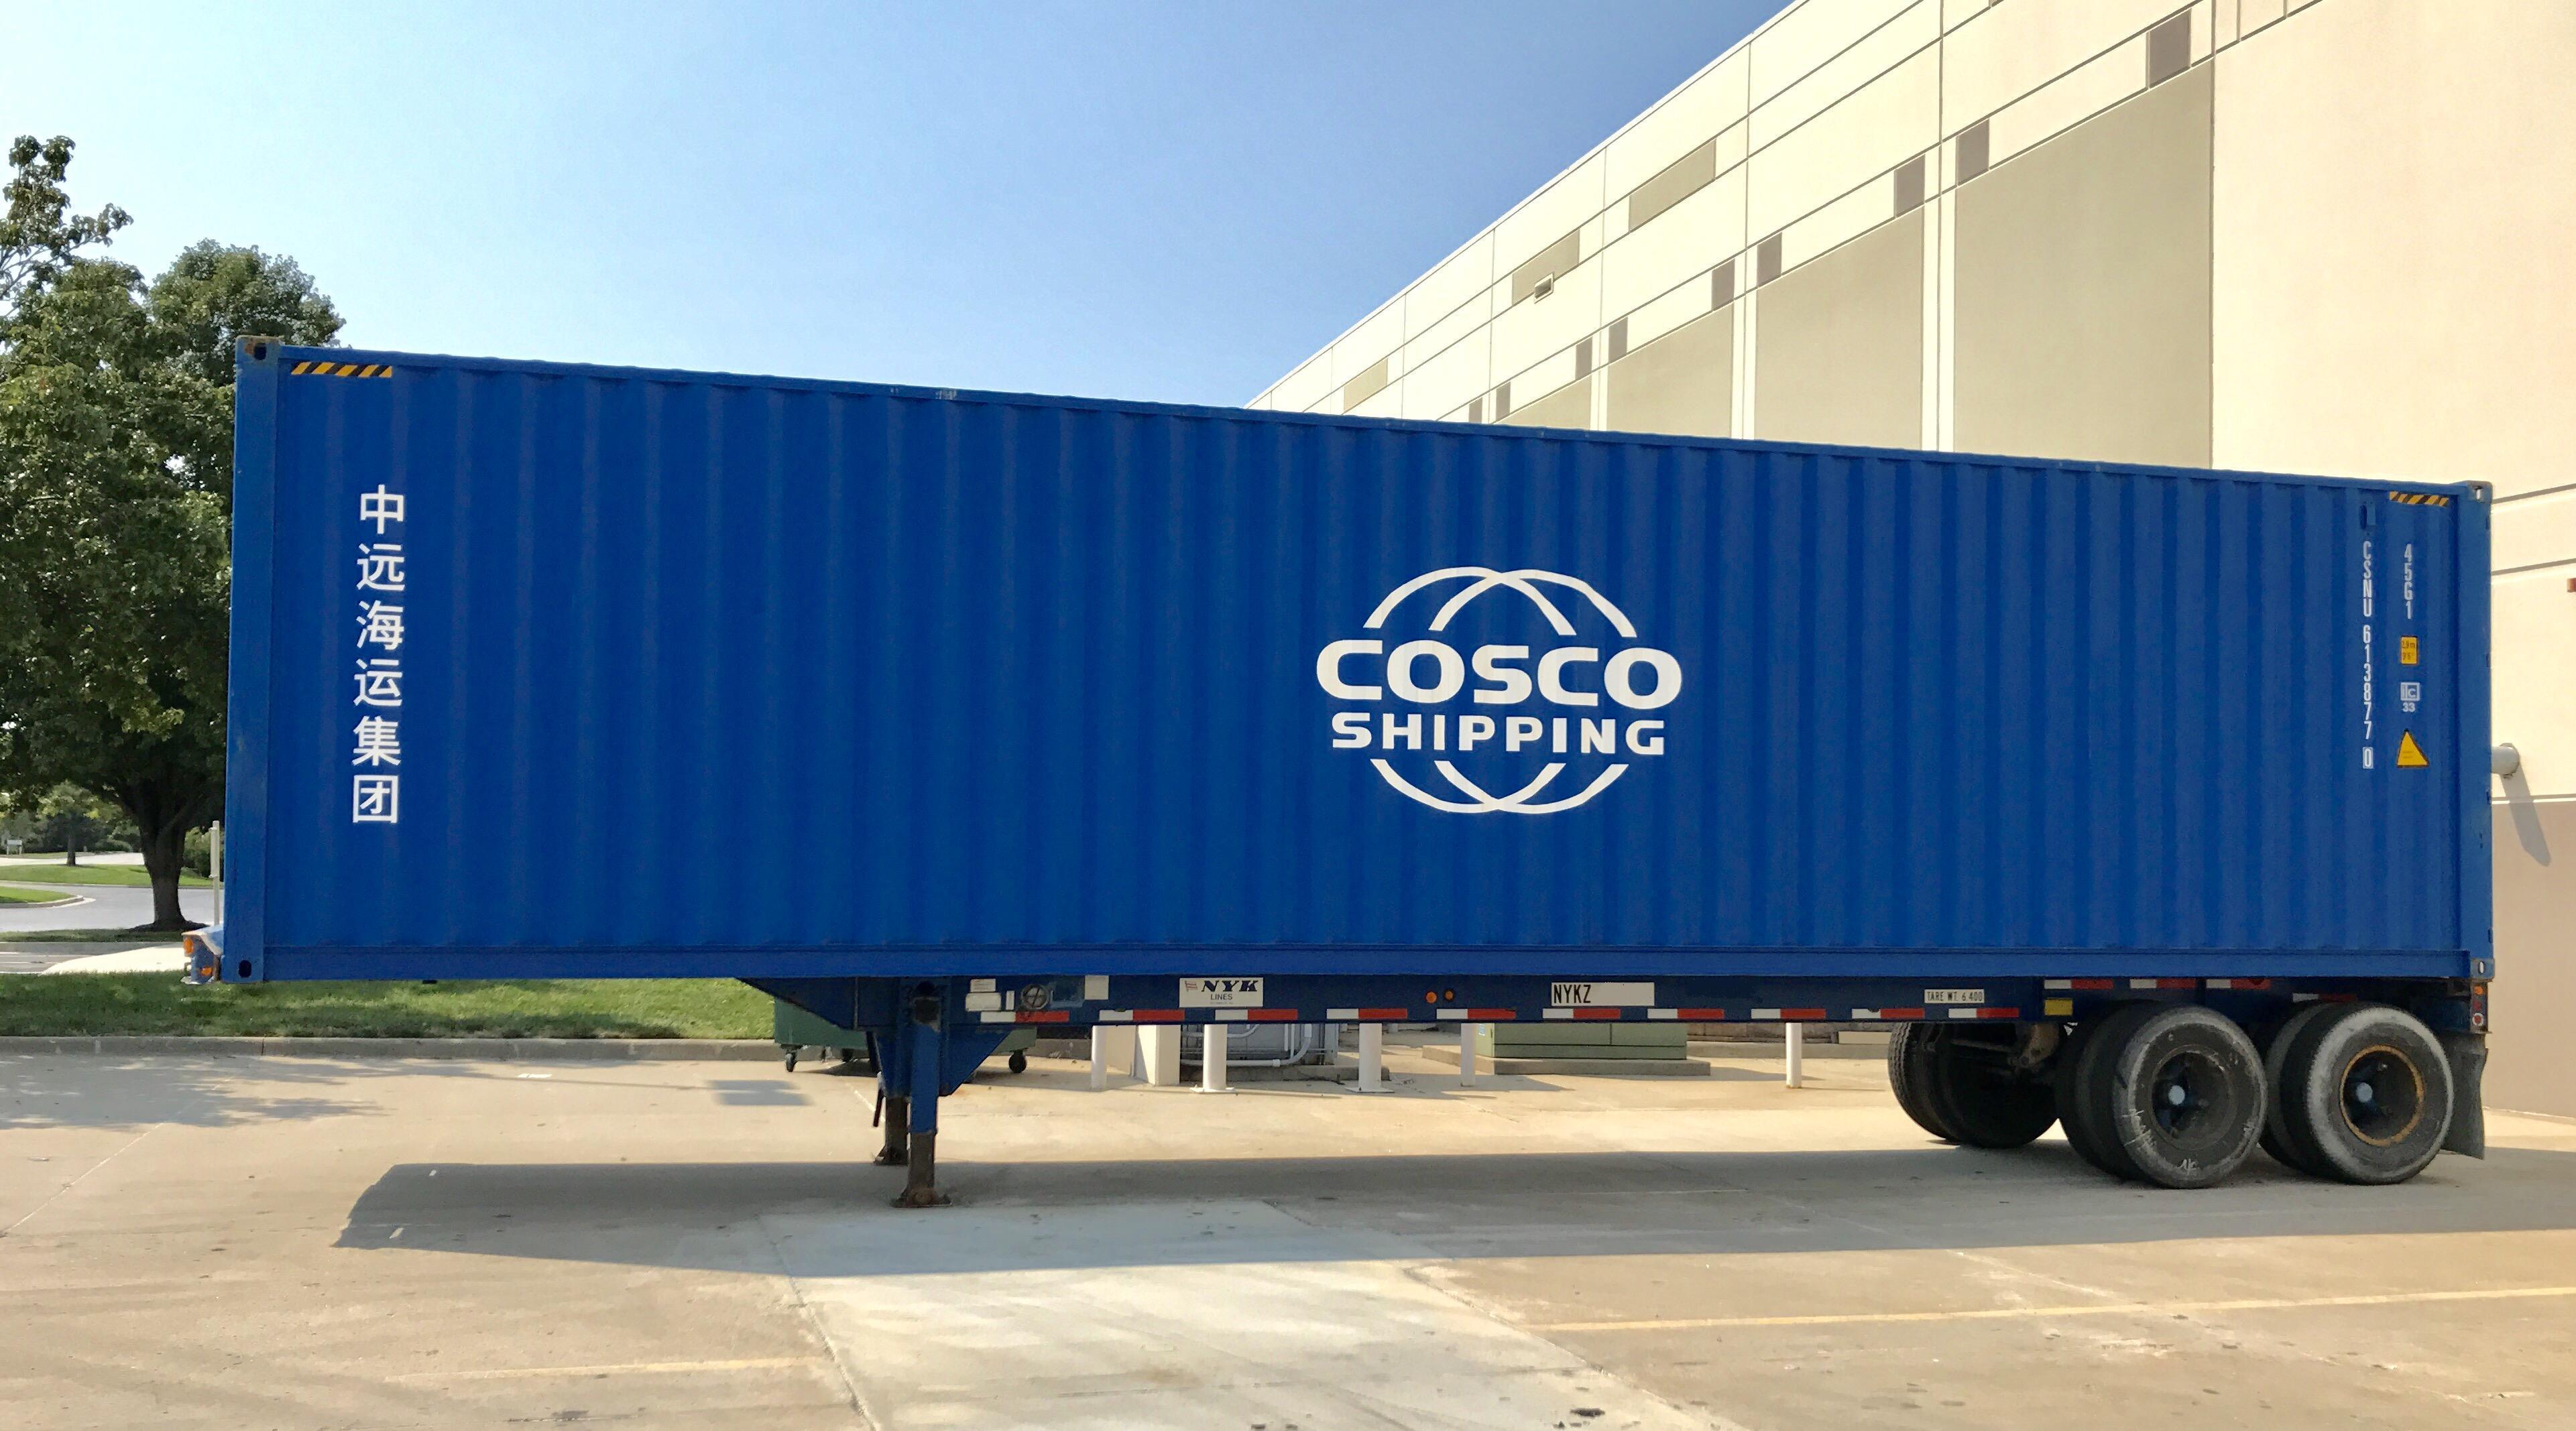 China COSCO Shipping - Wikipedia